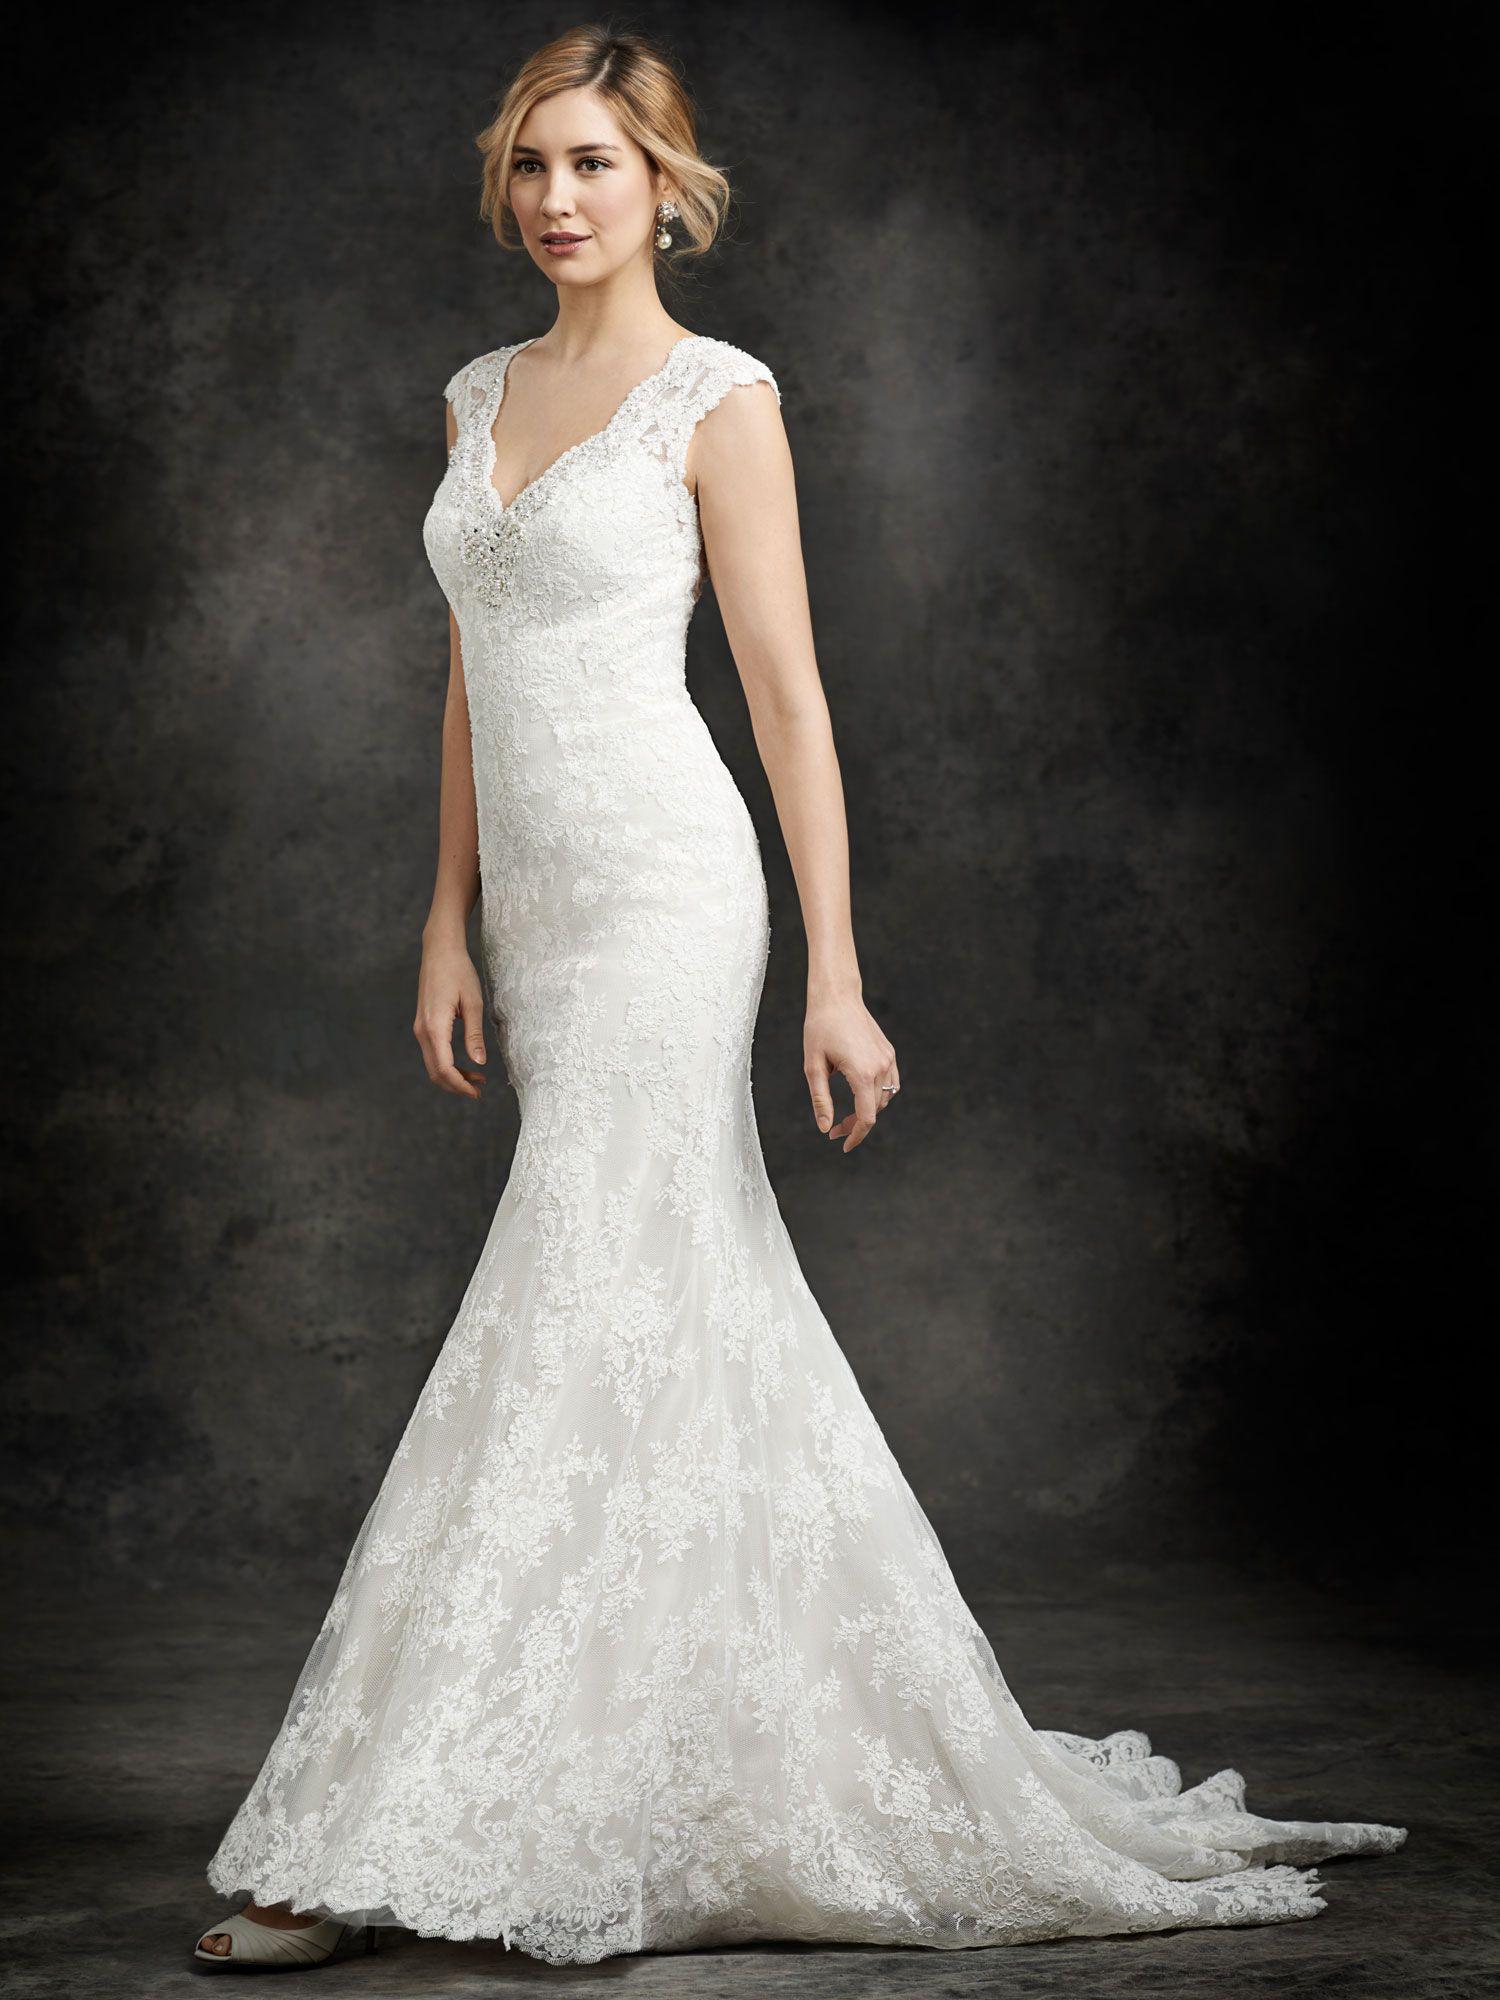 Alexis Kay Designs Bridal 128 E. Lincoln Hwy. Dekalb, IL Ella Rosa ...